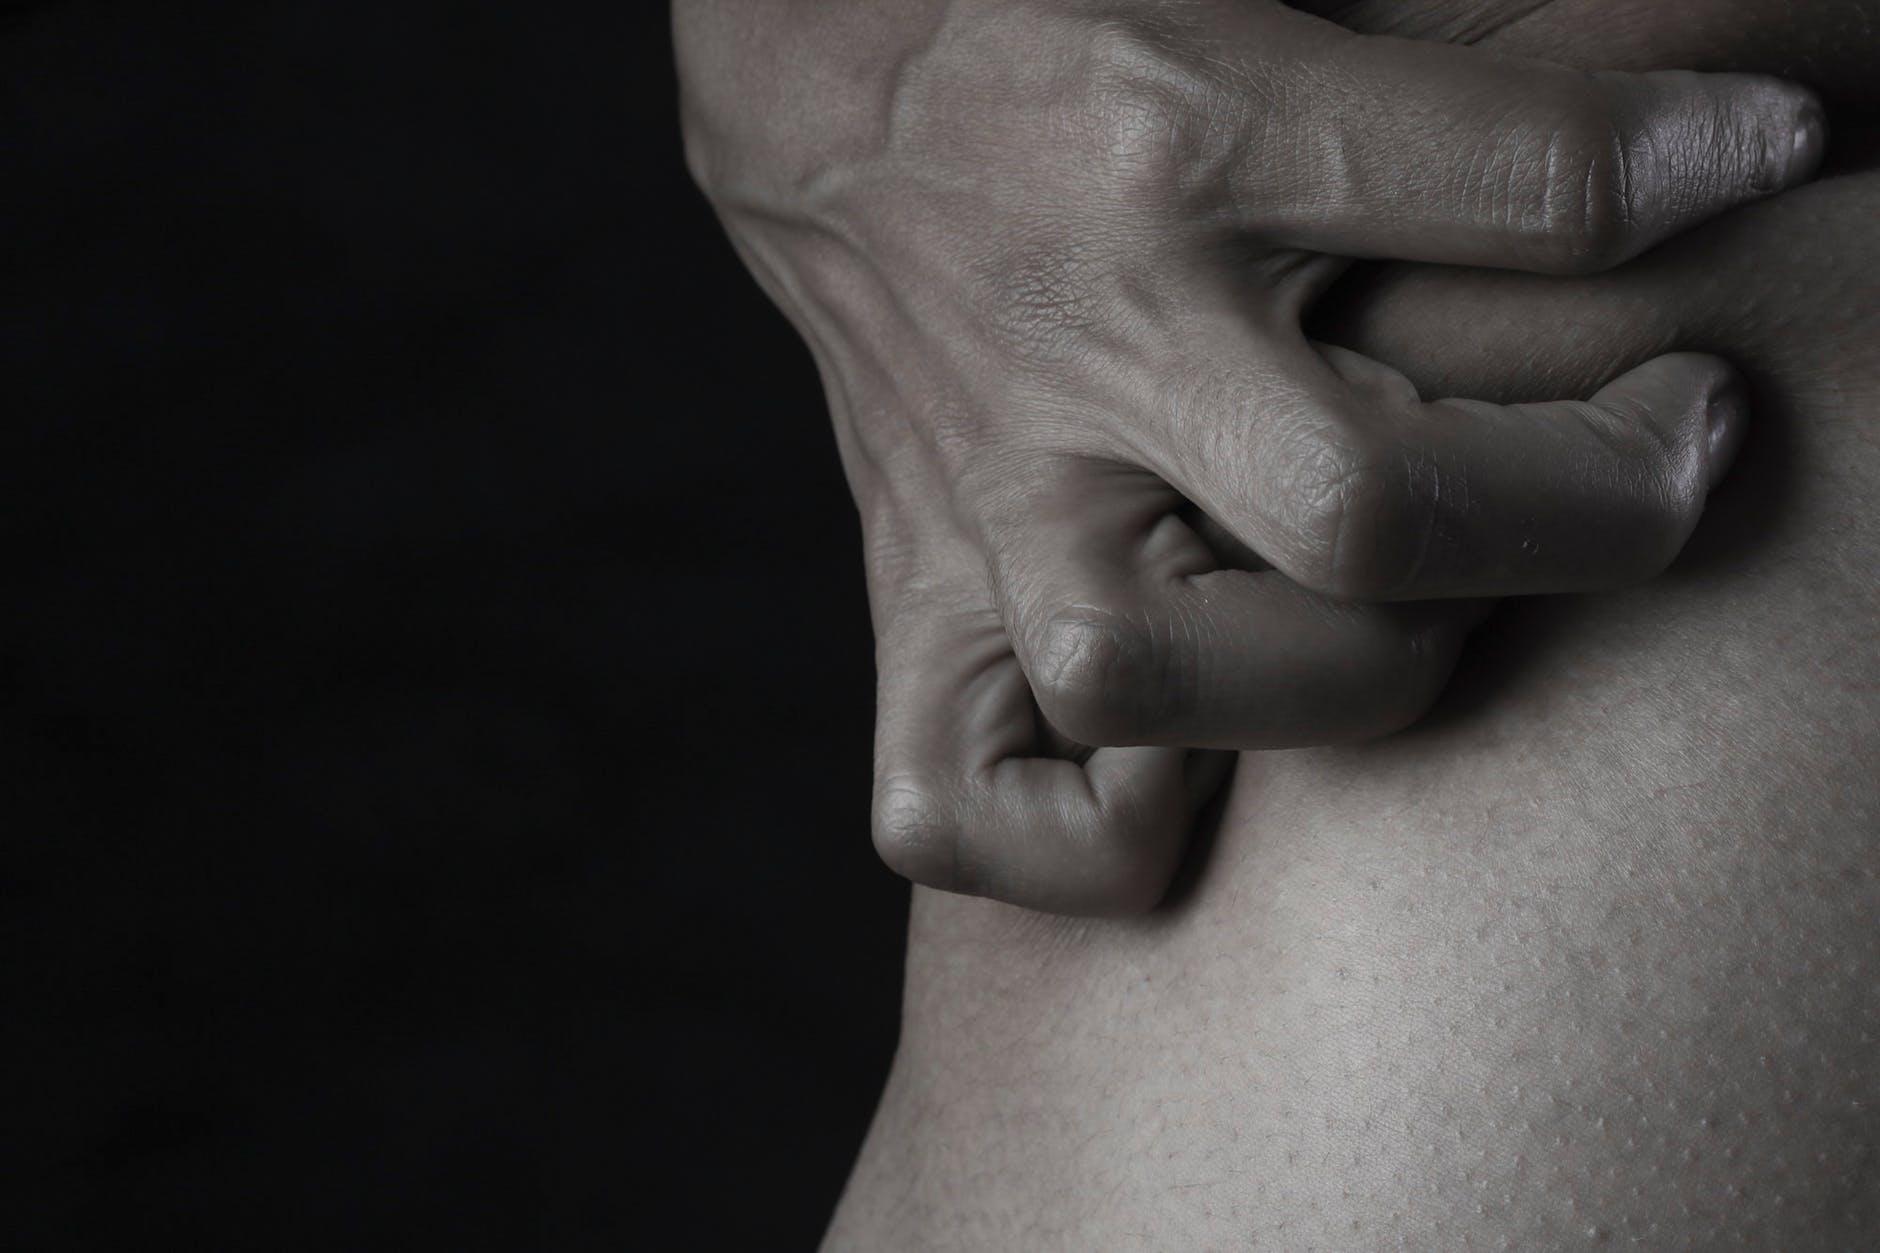 dureri articulare la picioare schimbarea vremii tratament dureros la nivelul gleznei